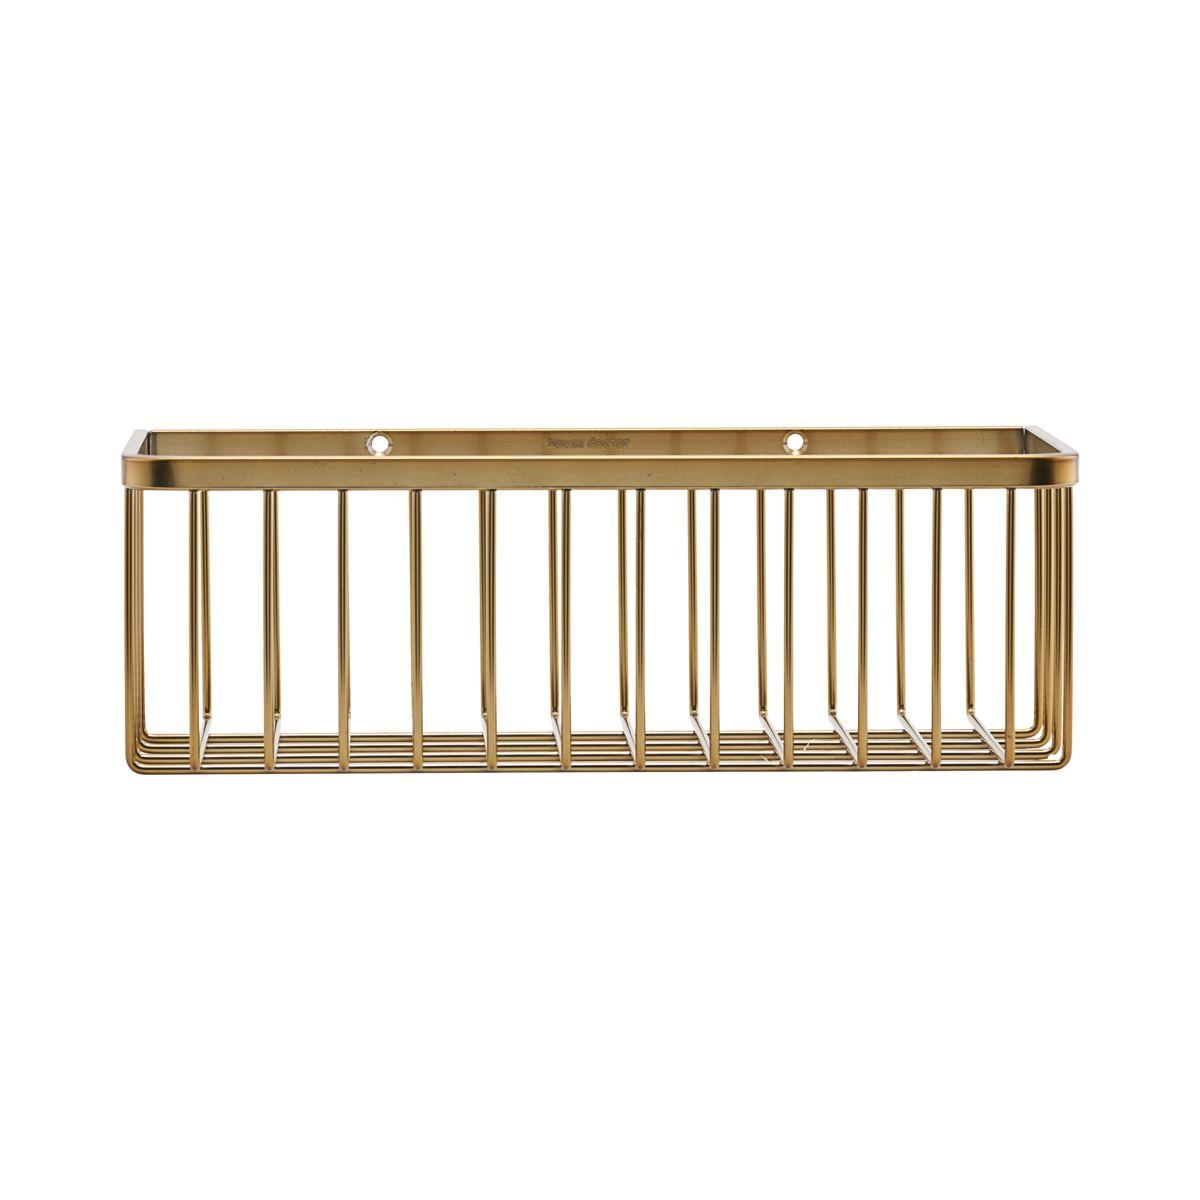 House Doctor - Bath Basket Small - Brass (WG0320)